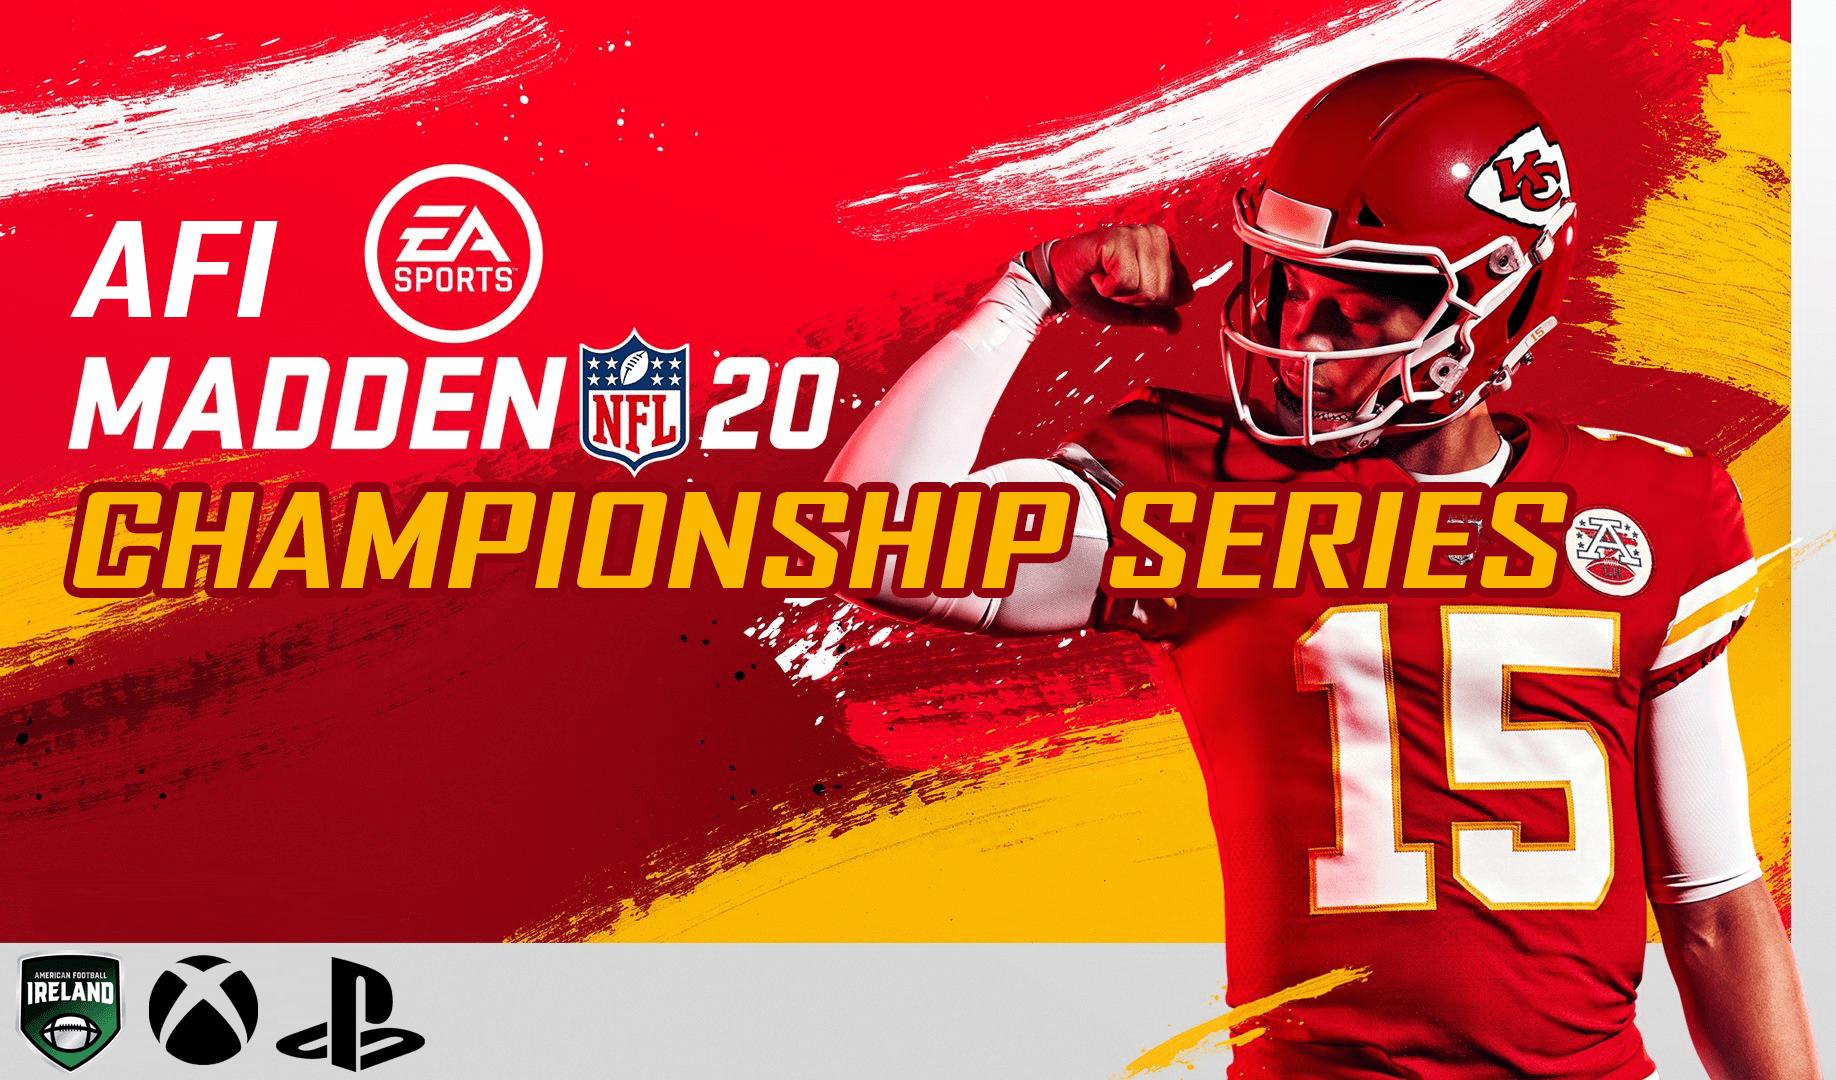 AFI Madden Championship Series 2020